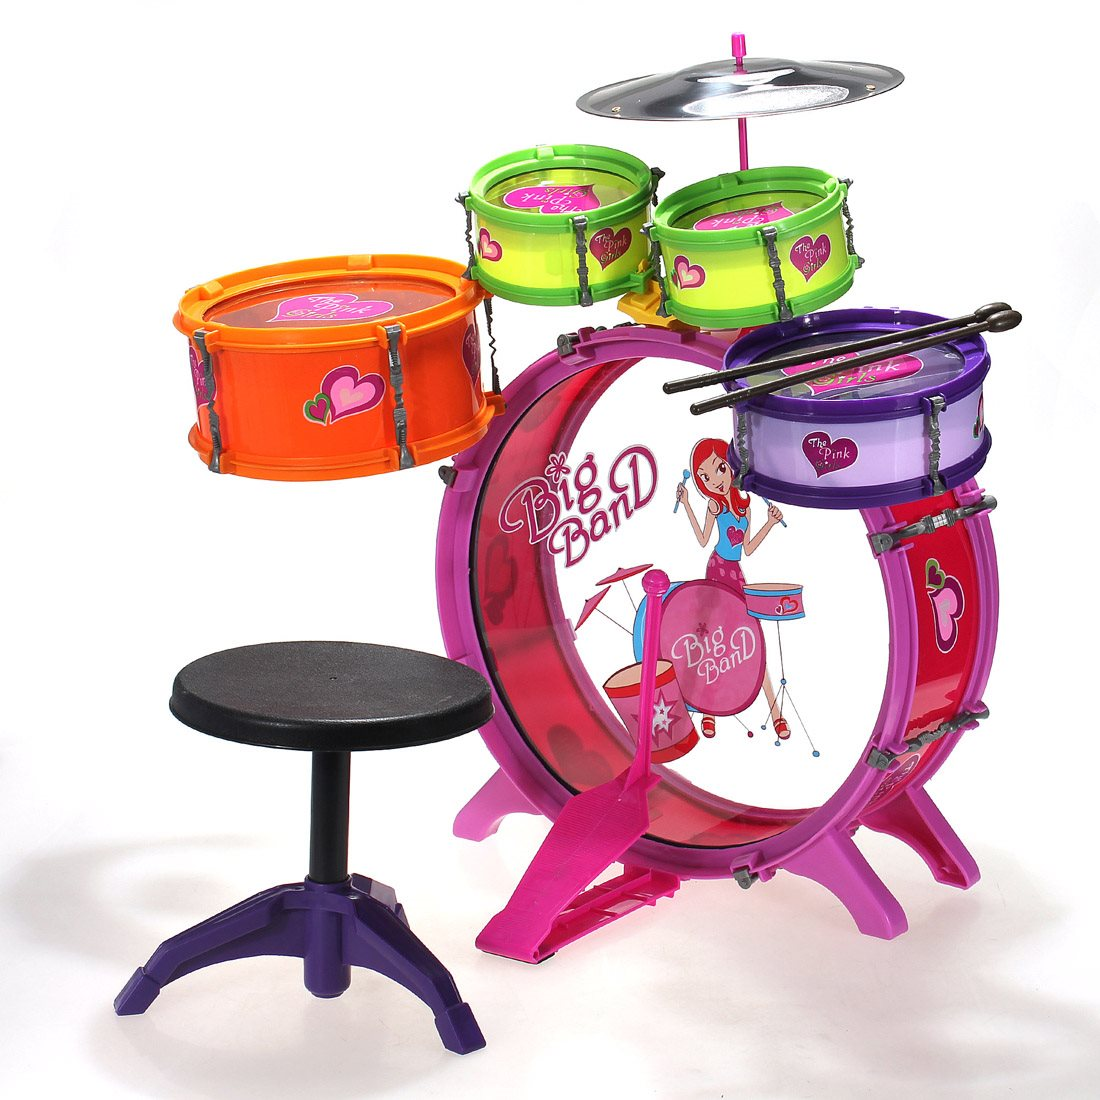 Calmly Brass Drum Drum Drum From Sports Plastic Drum Kit Musical Instruments Toy Plastic Drum Kit Musical Instruments Toy Babies Toddler Drum Set Australia Toy Drum Set baby Toddler Drum Set